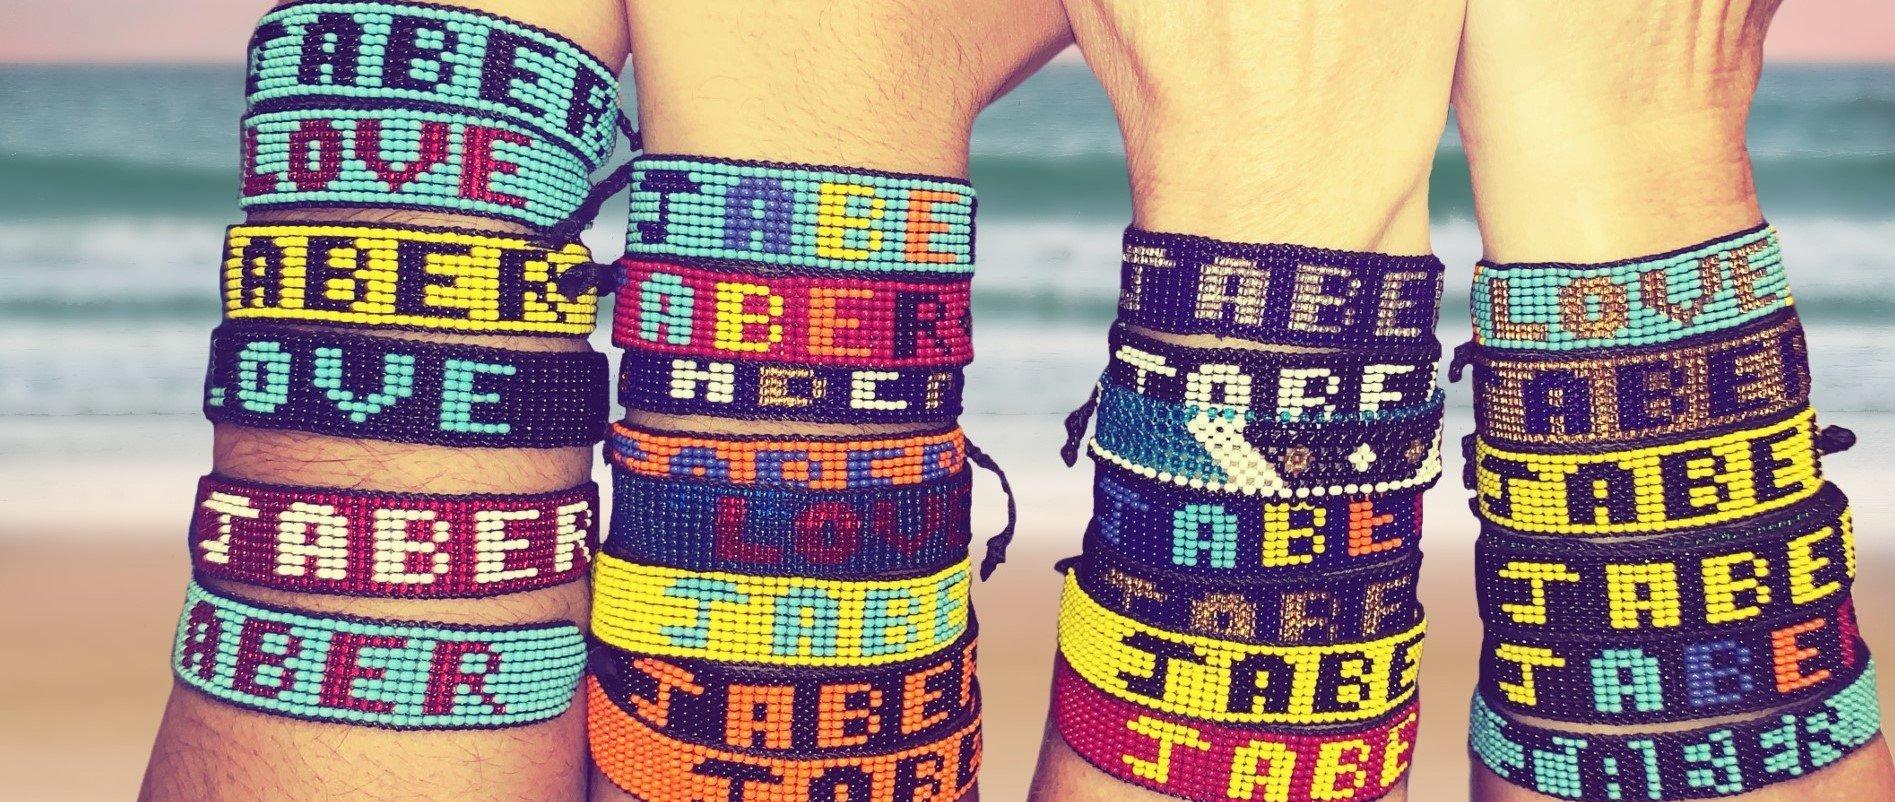 https://jabersoul.com/collections/jaber-bracelets